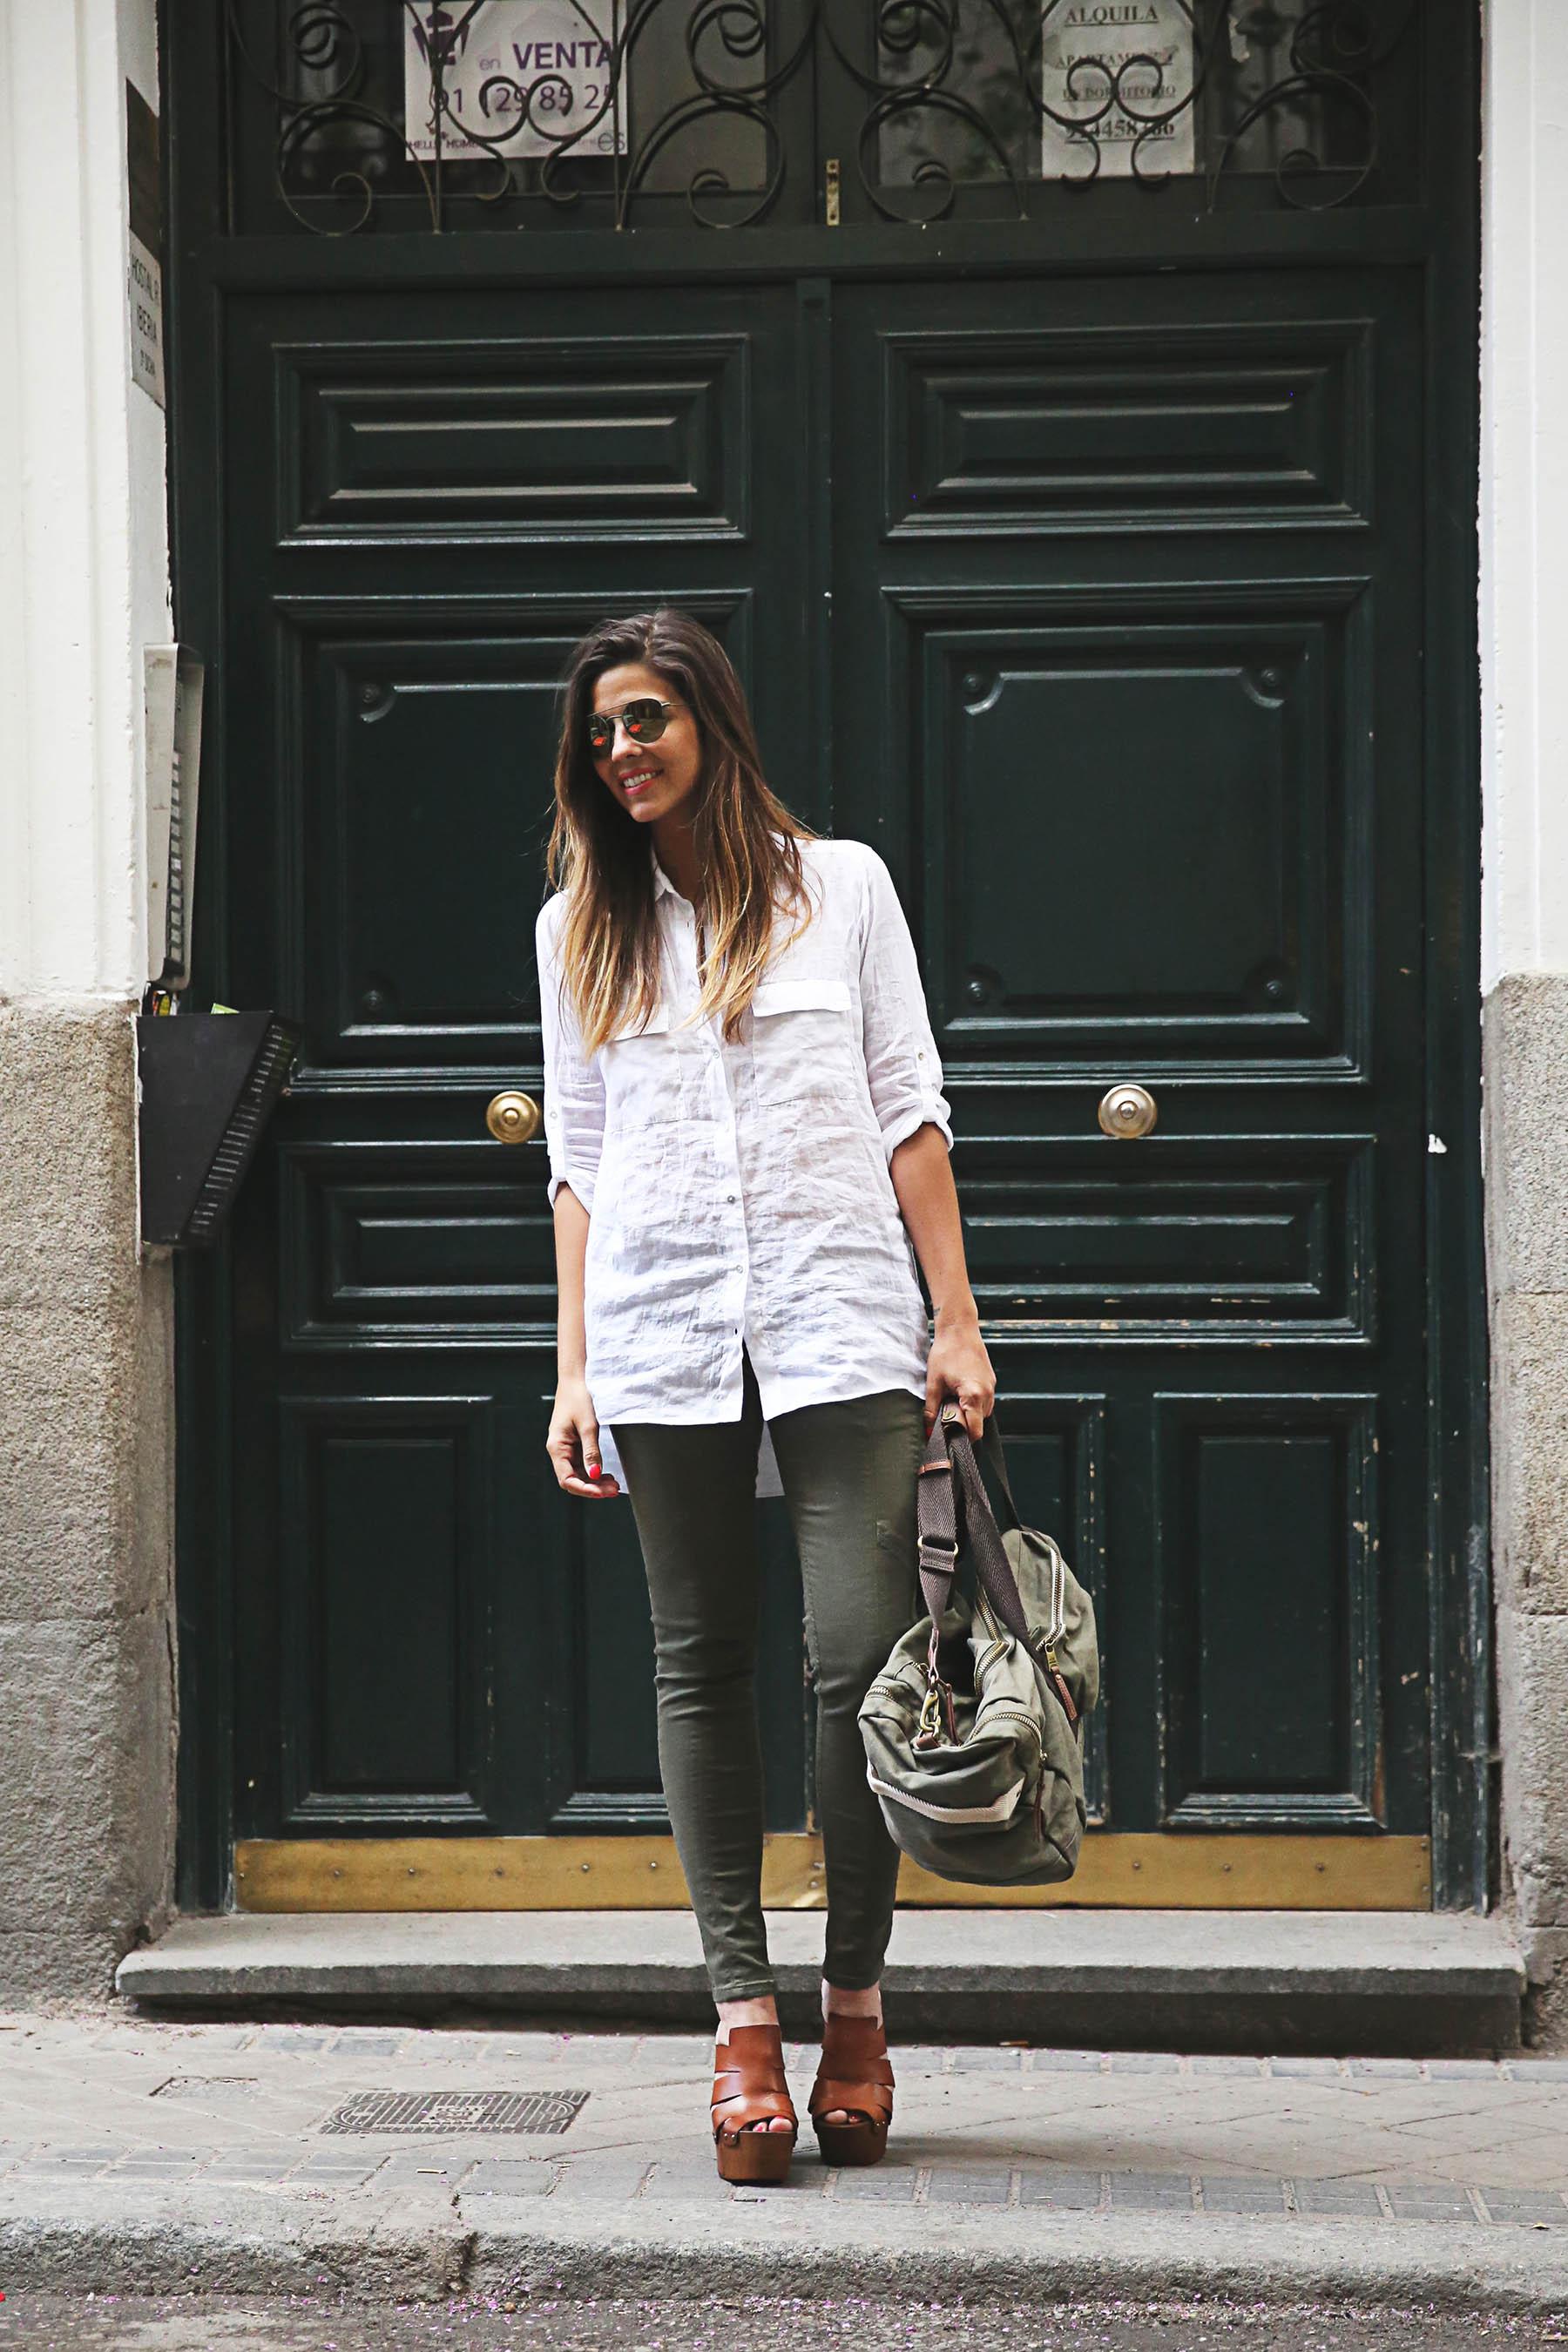 trendy-taste-look-outfit-street-style-steve-madden-ootd-blog-blogger-fashion-spain-moda-españa-safari-traveling-viaje-bolsa-bag-khaki-caqui-pants-sandalias-zuecos-11